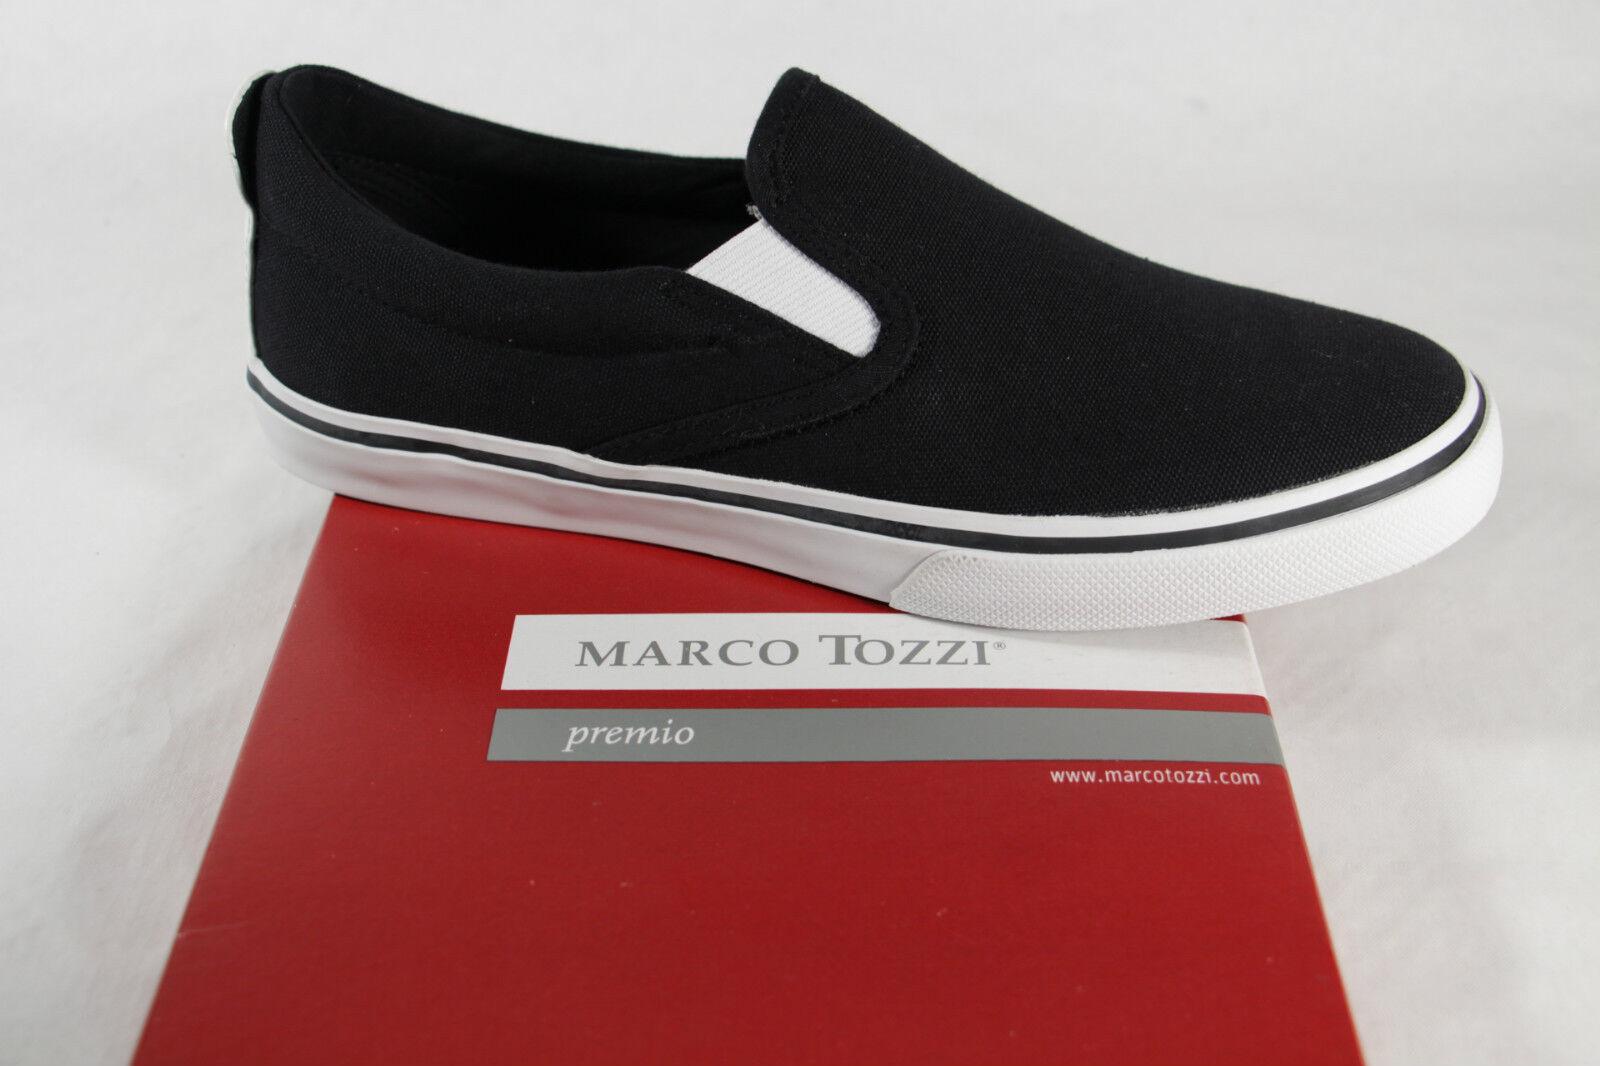 Marco Tozzi Women's Slip-Ons, Black, Rubber Sole, Fabric New